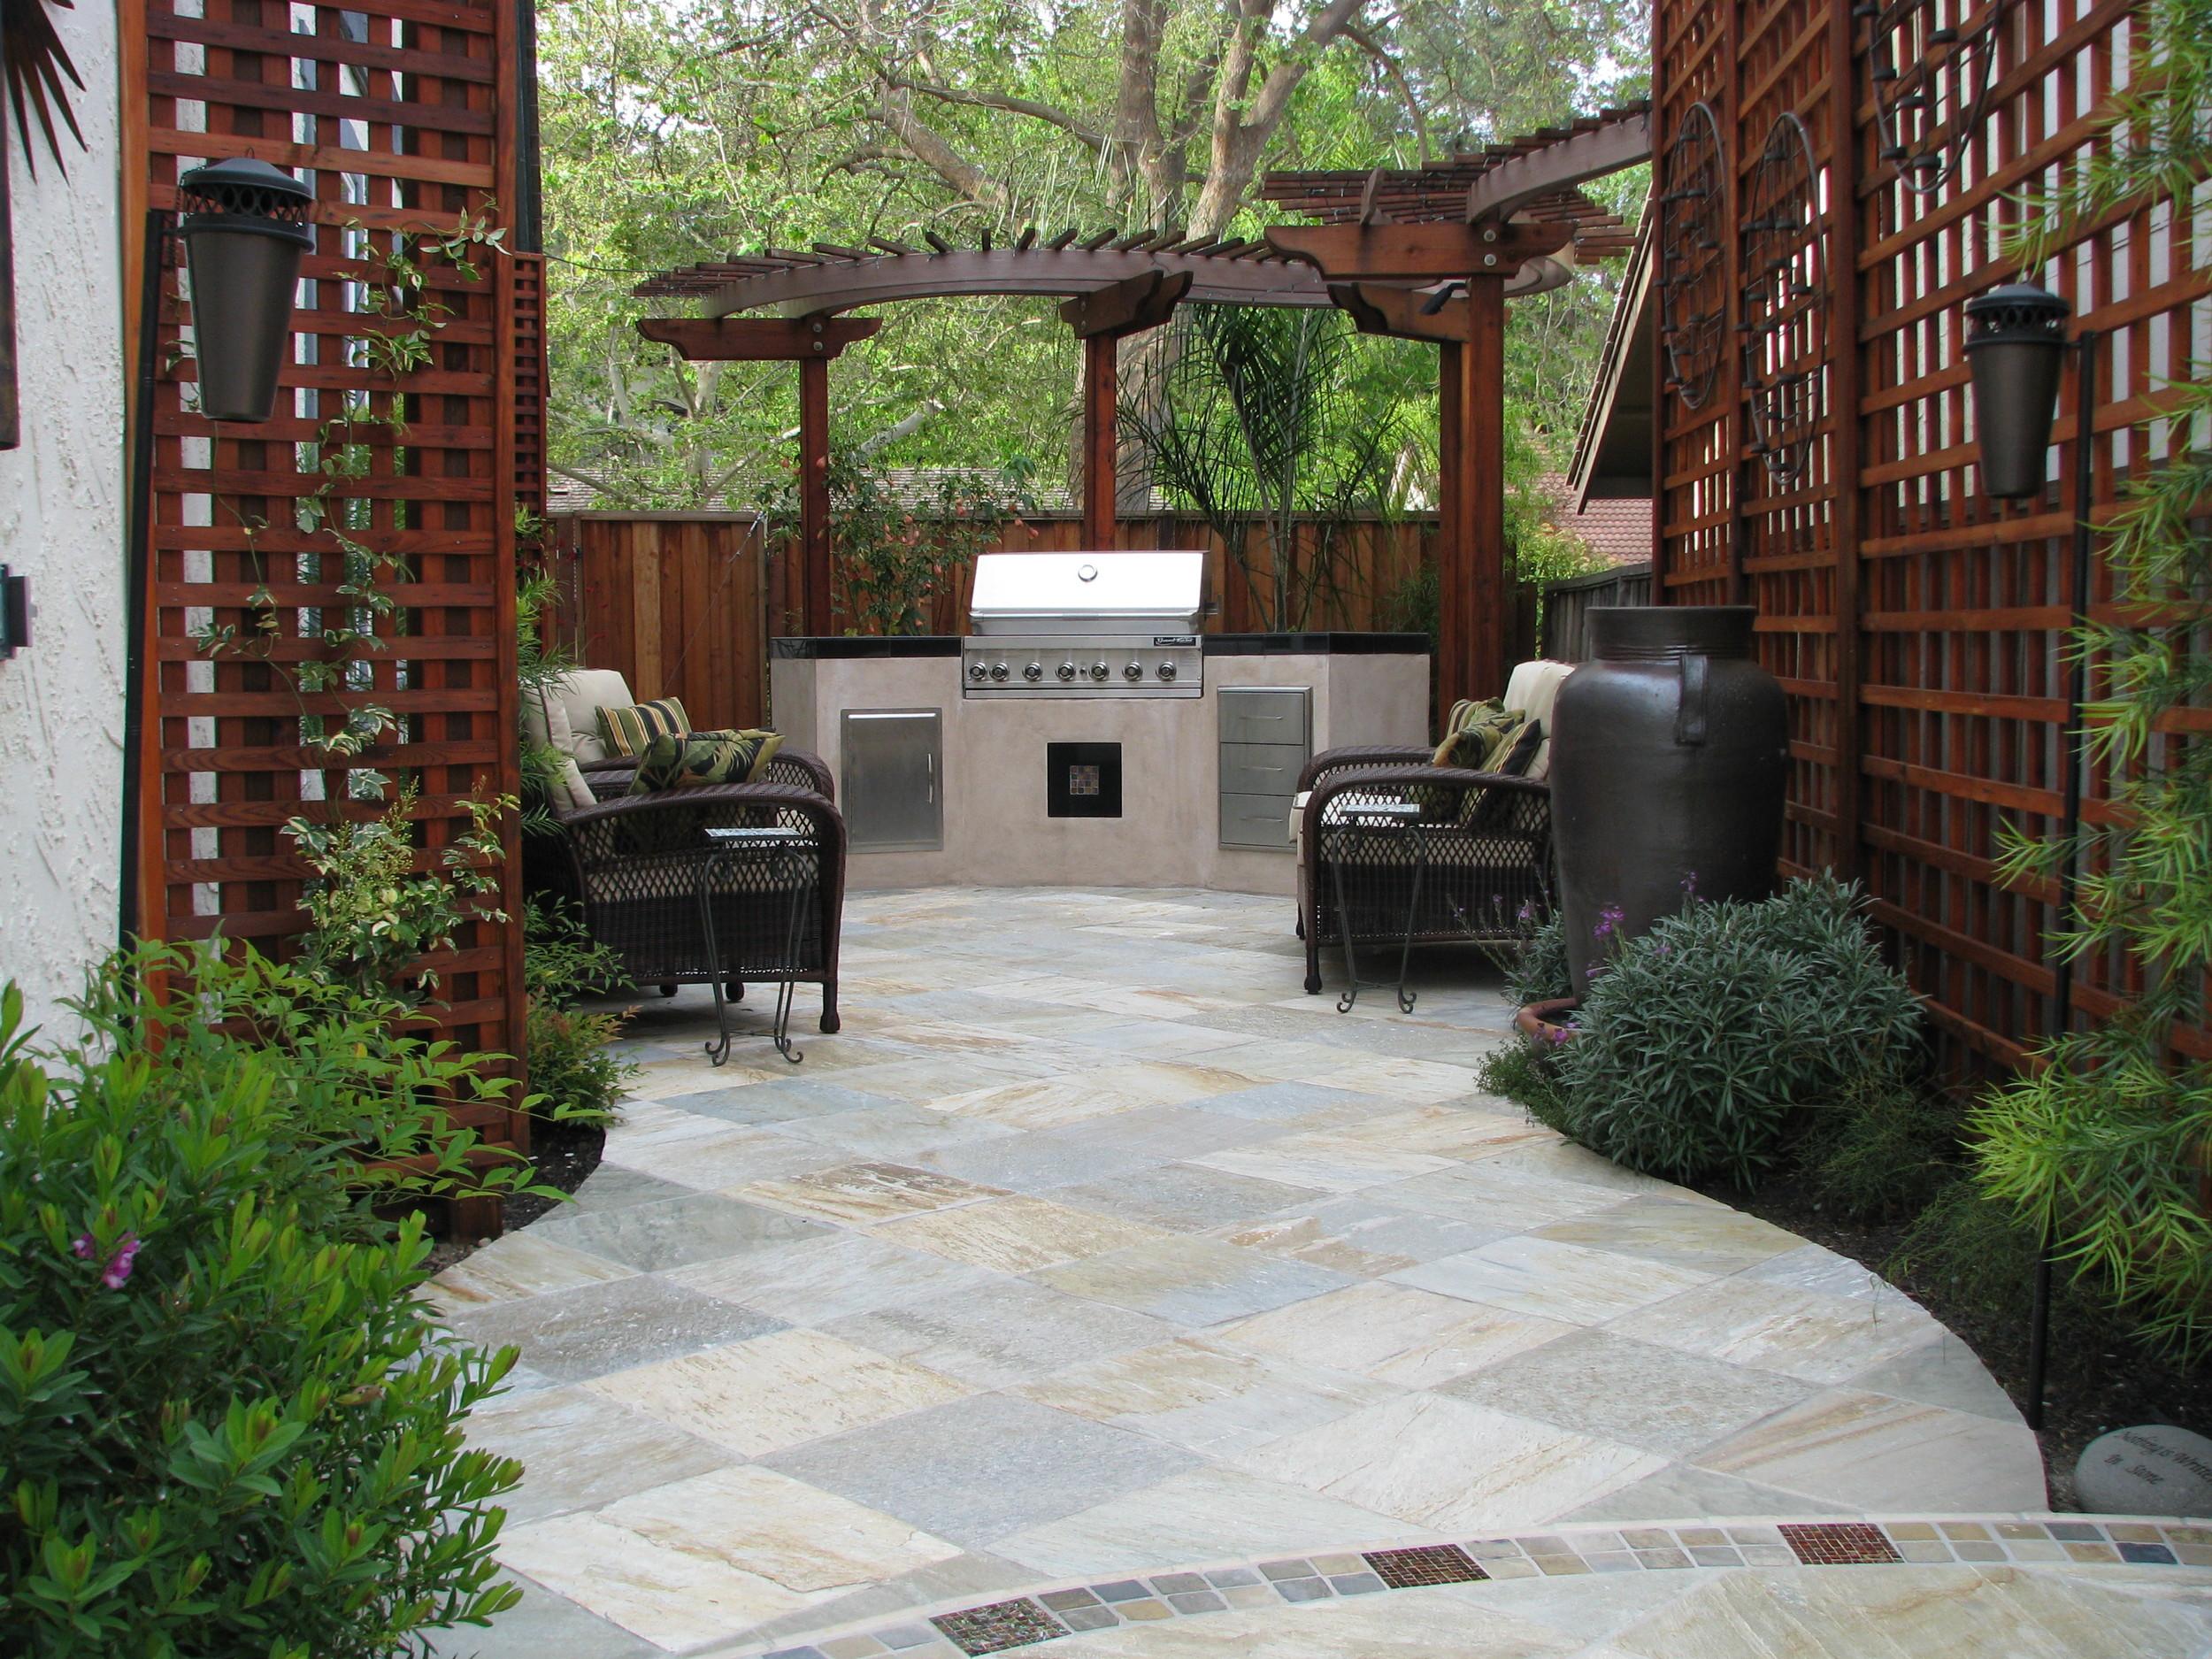 Award Winning Outdoor Kitchen and Patio